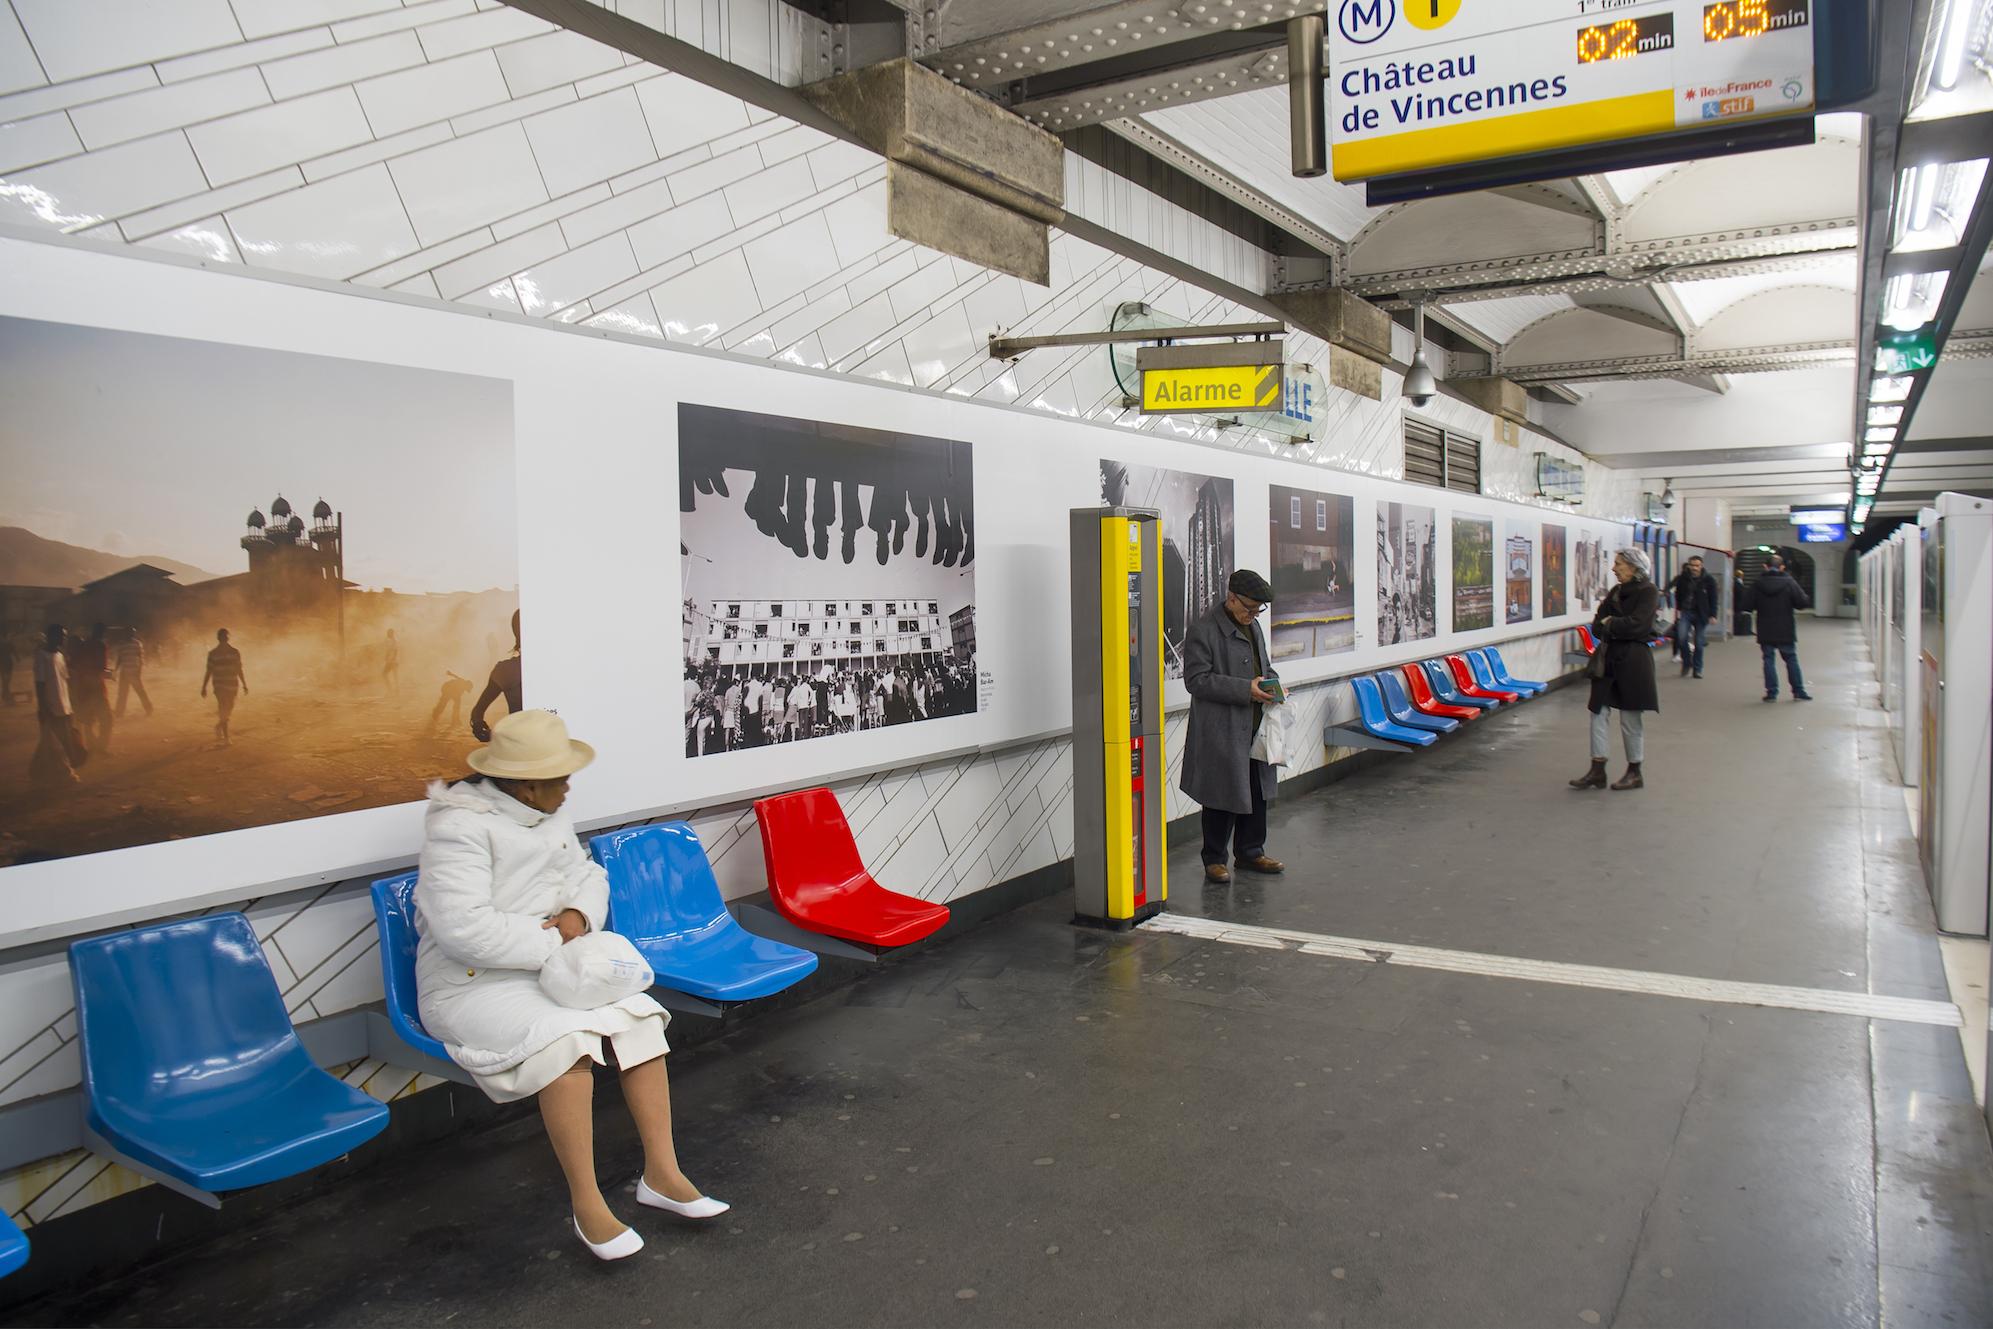 © RATP - Denis Sutton